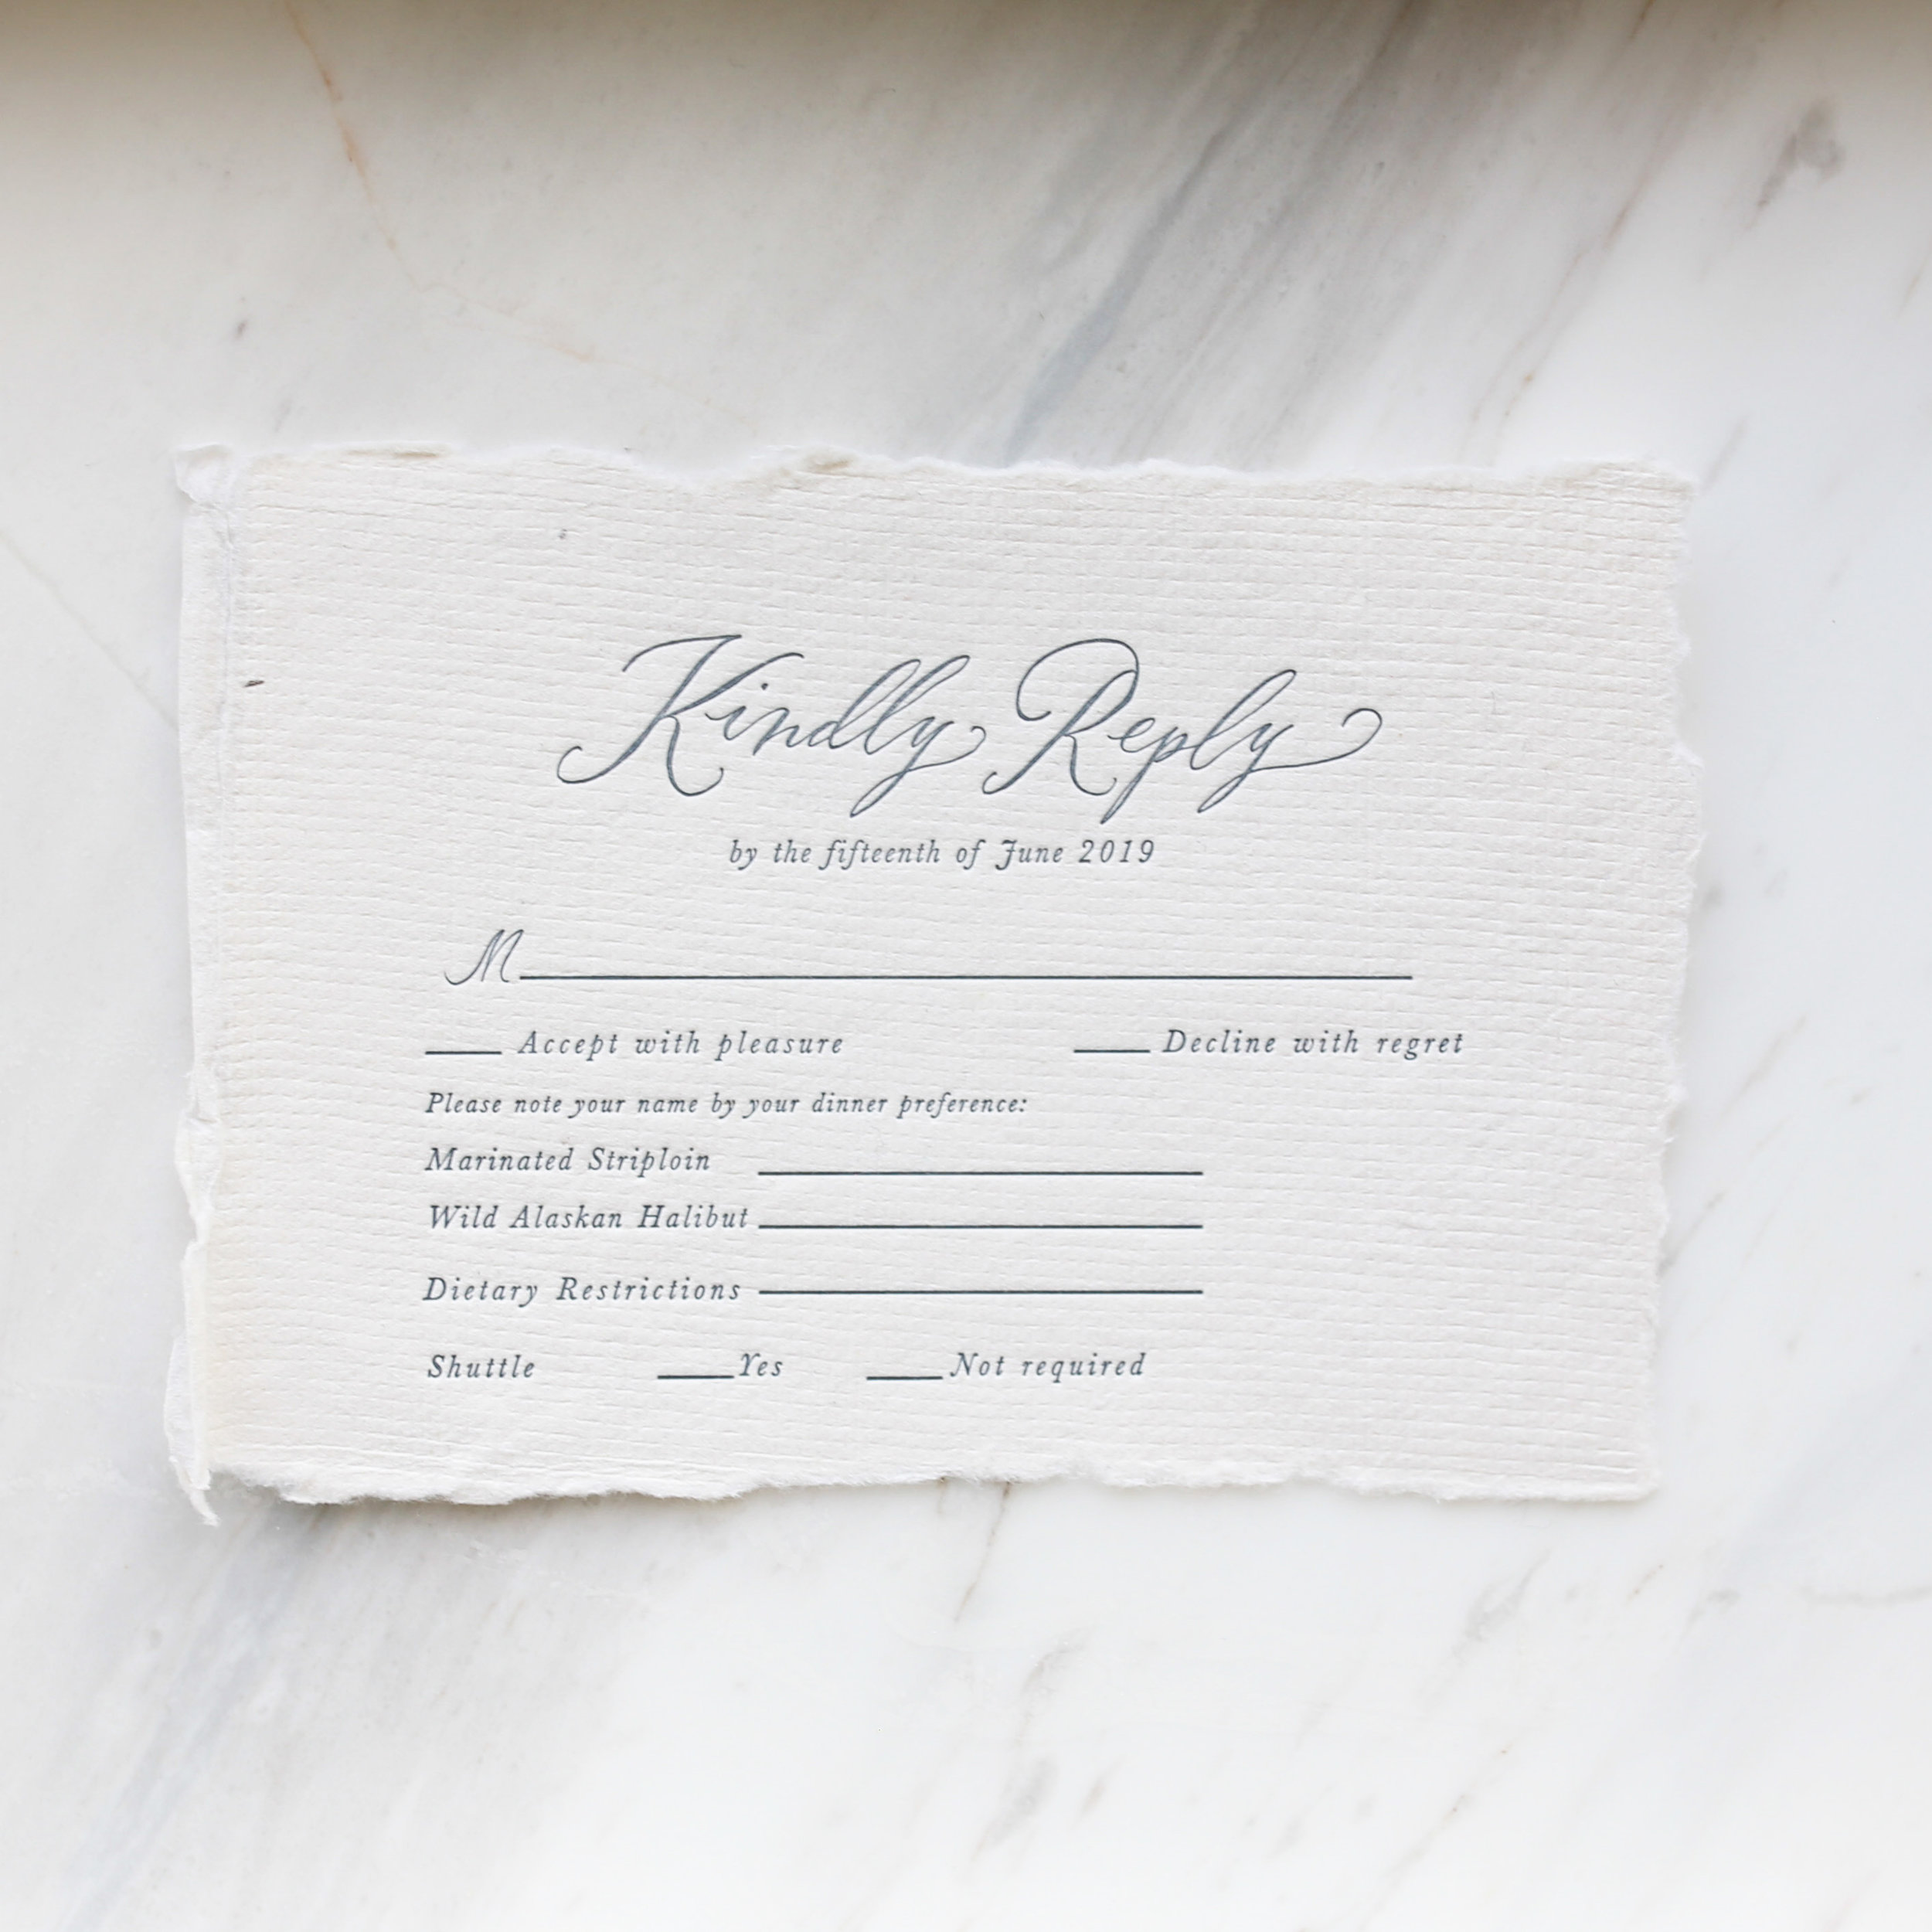 laurennicolefoot-2019-april-wedding-invitations-13 copy.jpg